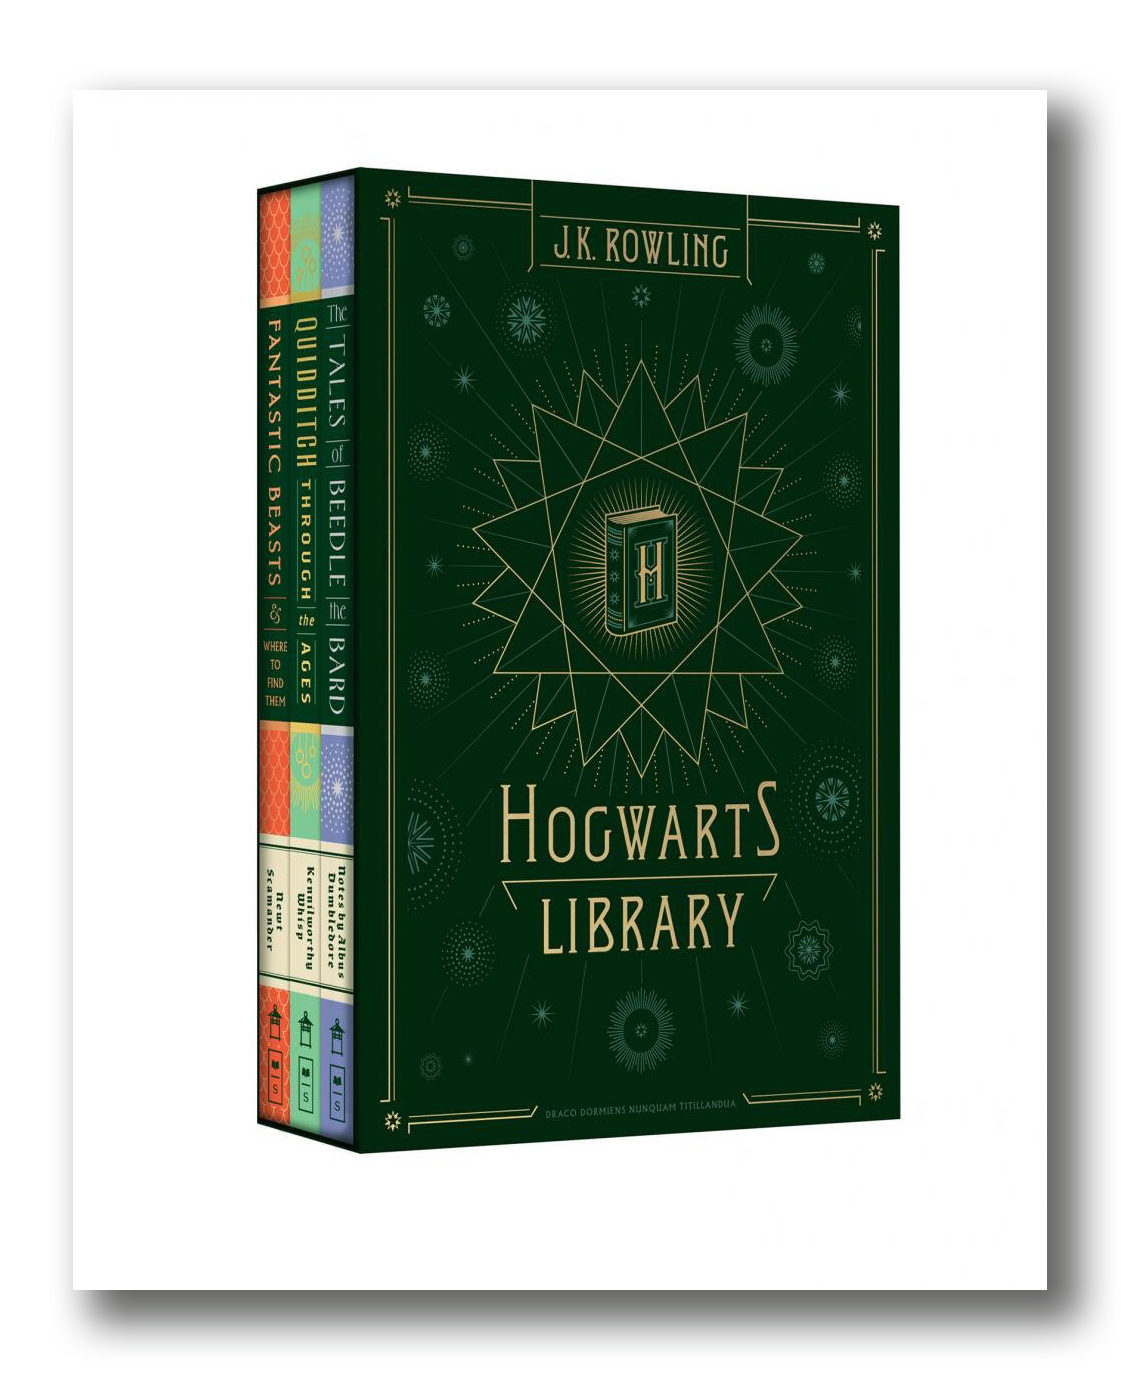 Hogwarts Library.jpg